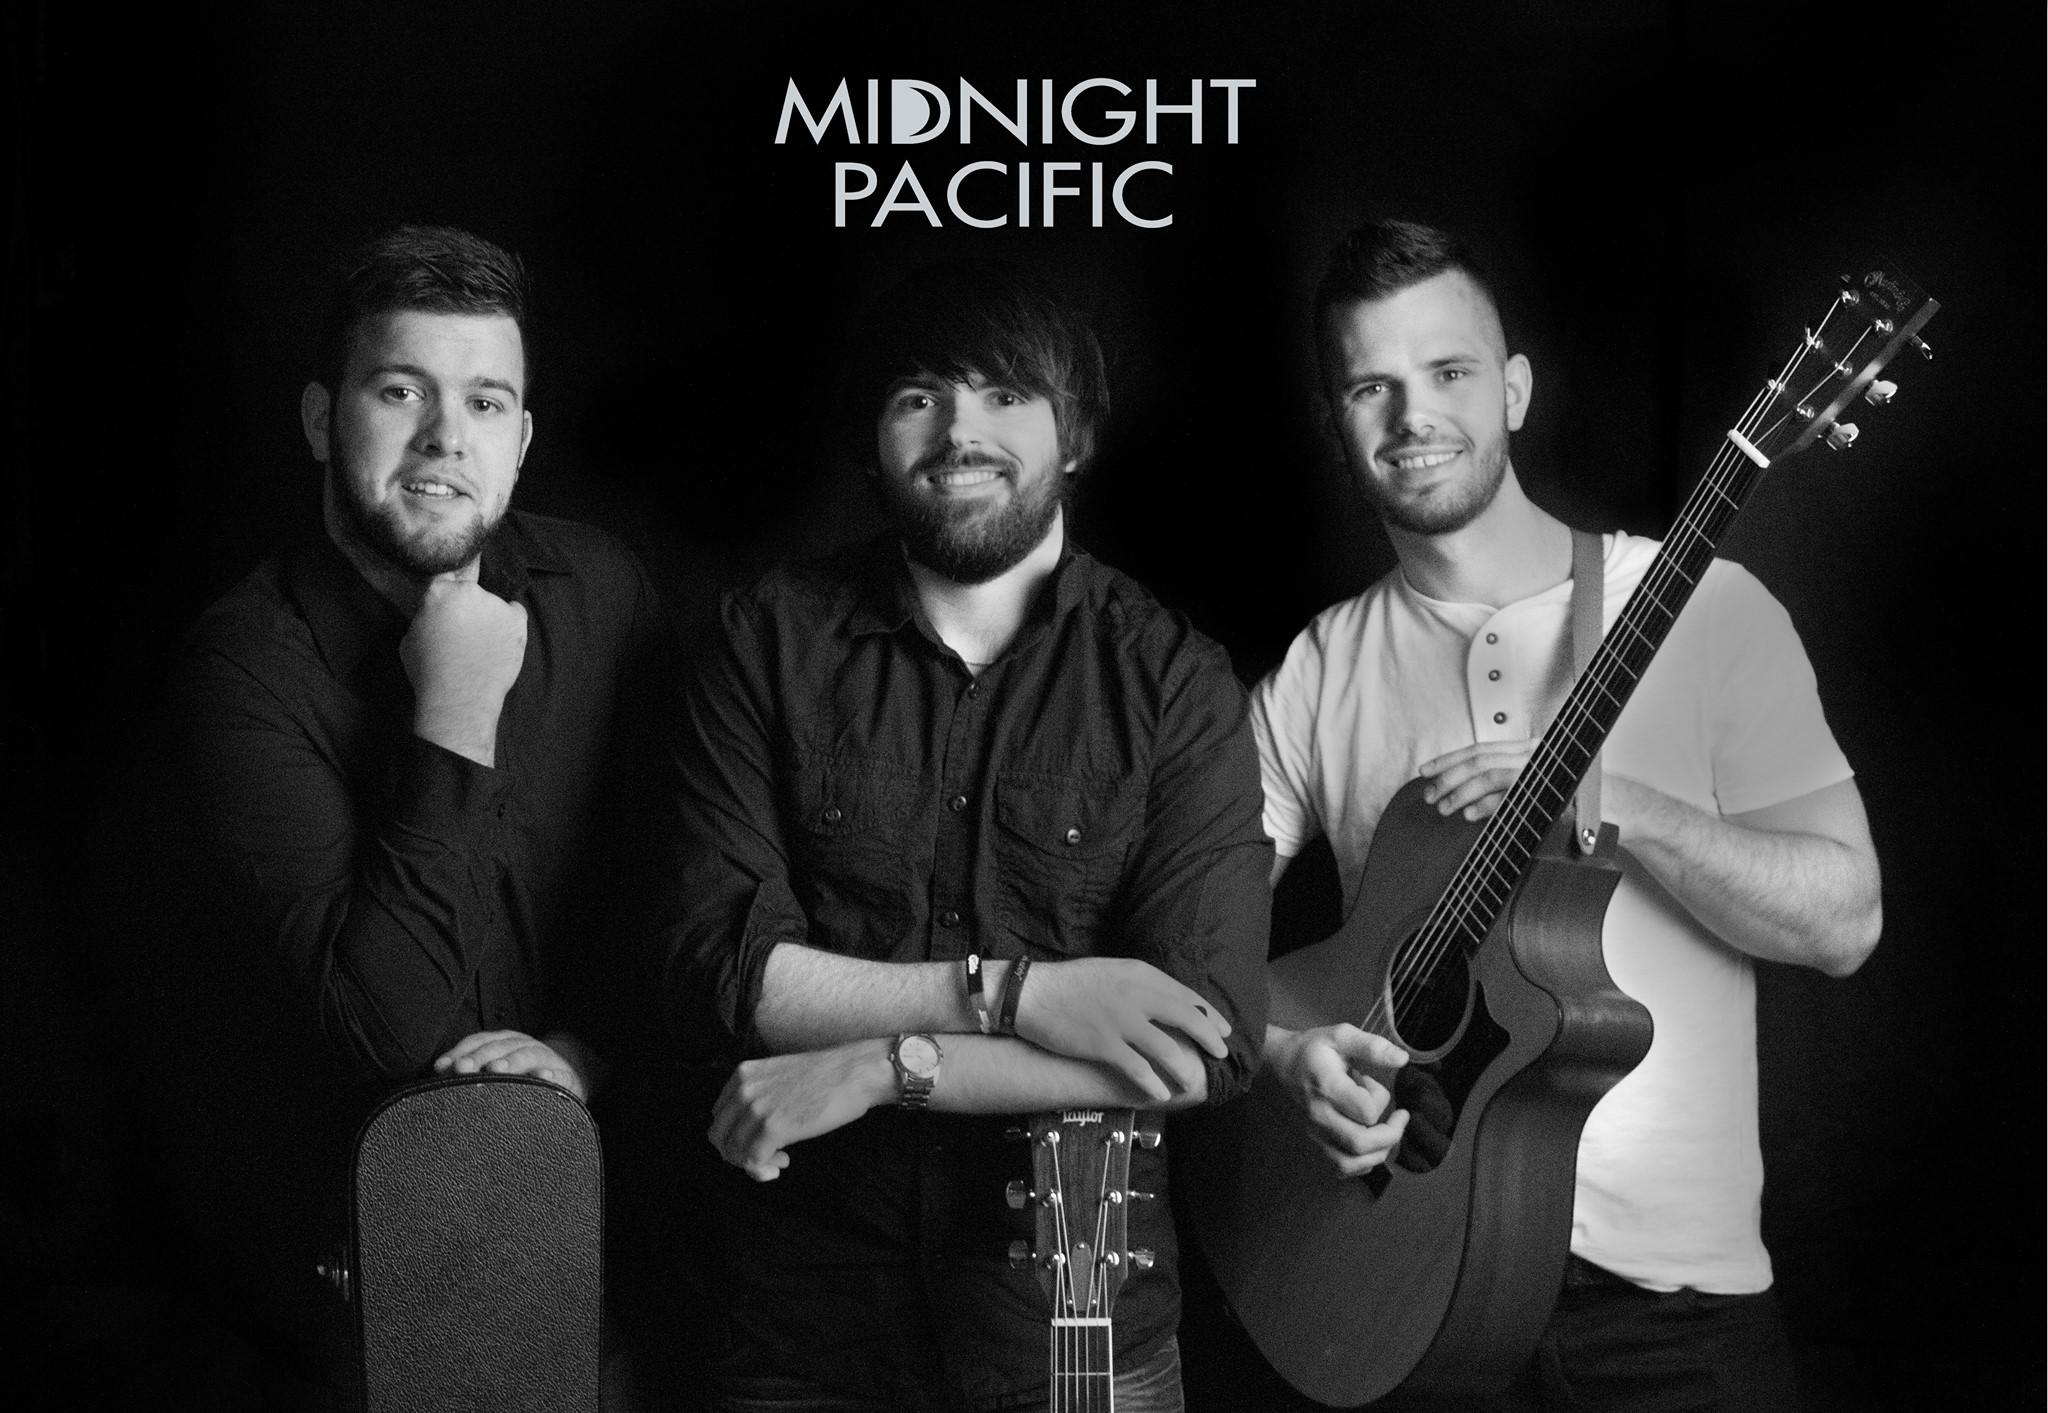 Midnight Pacific